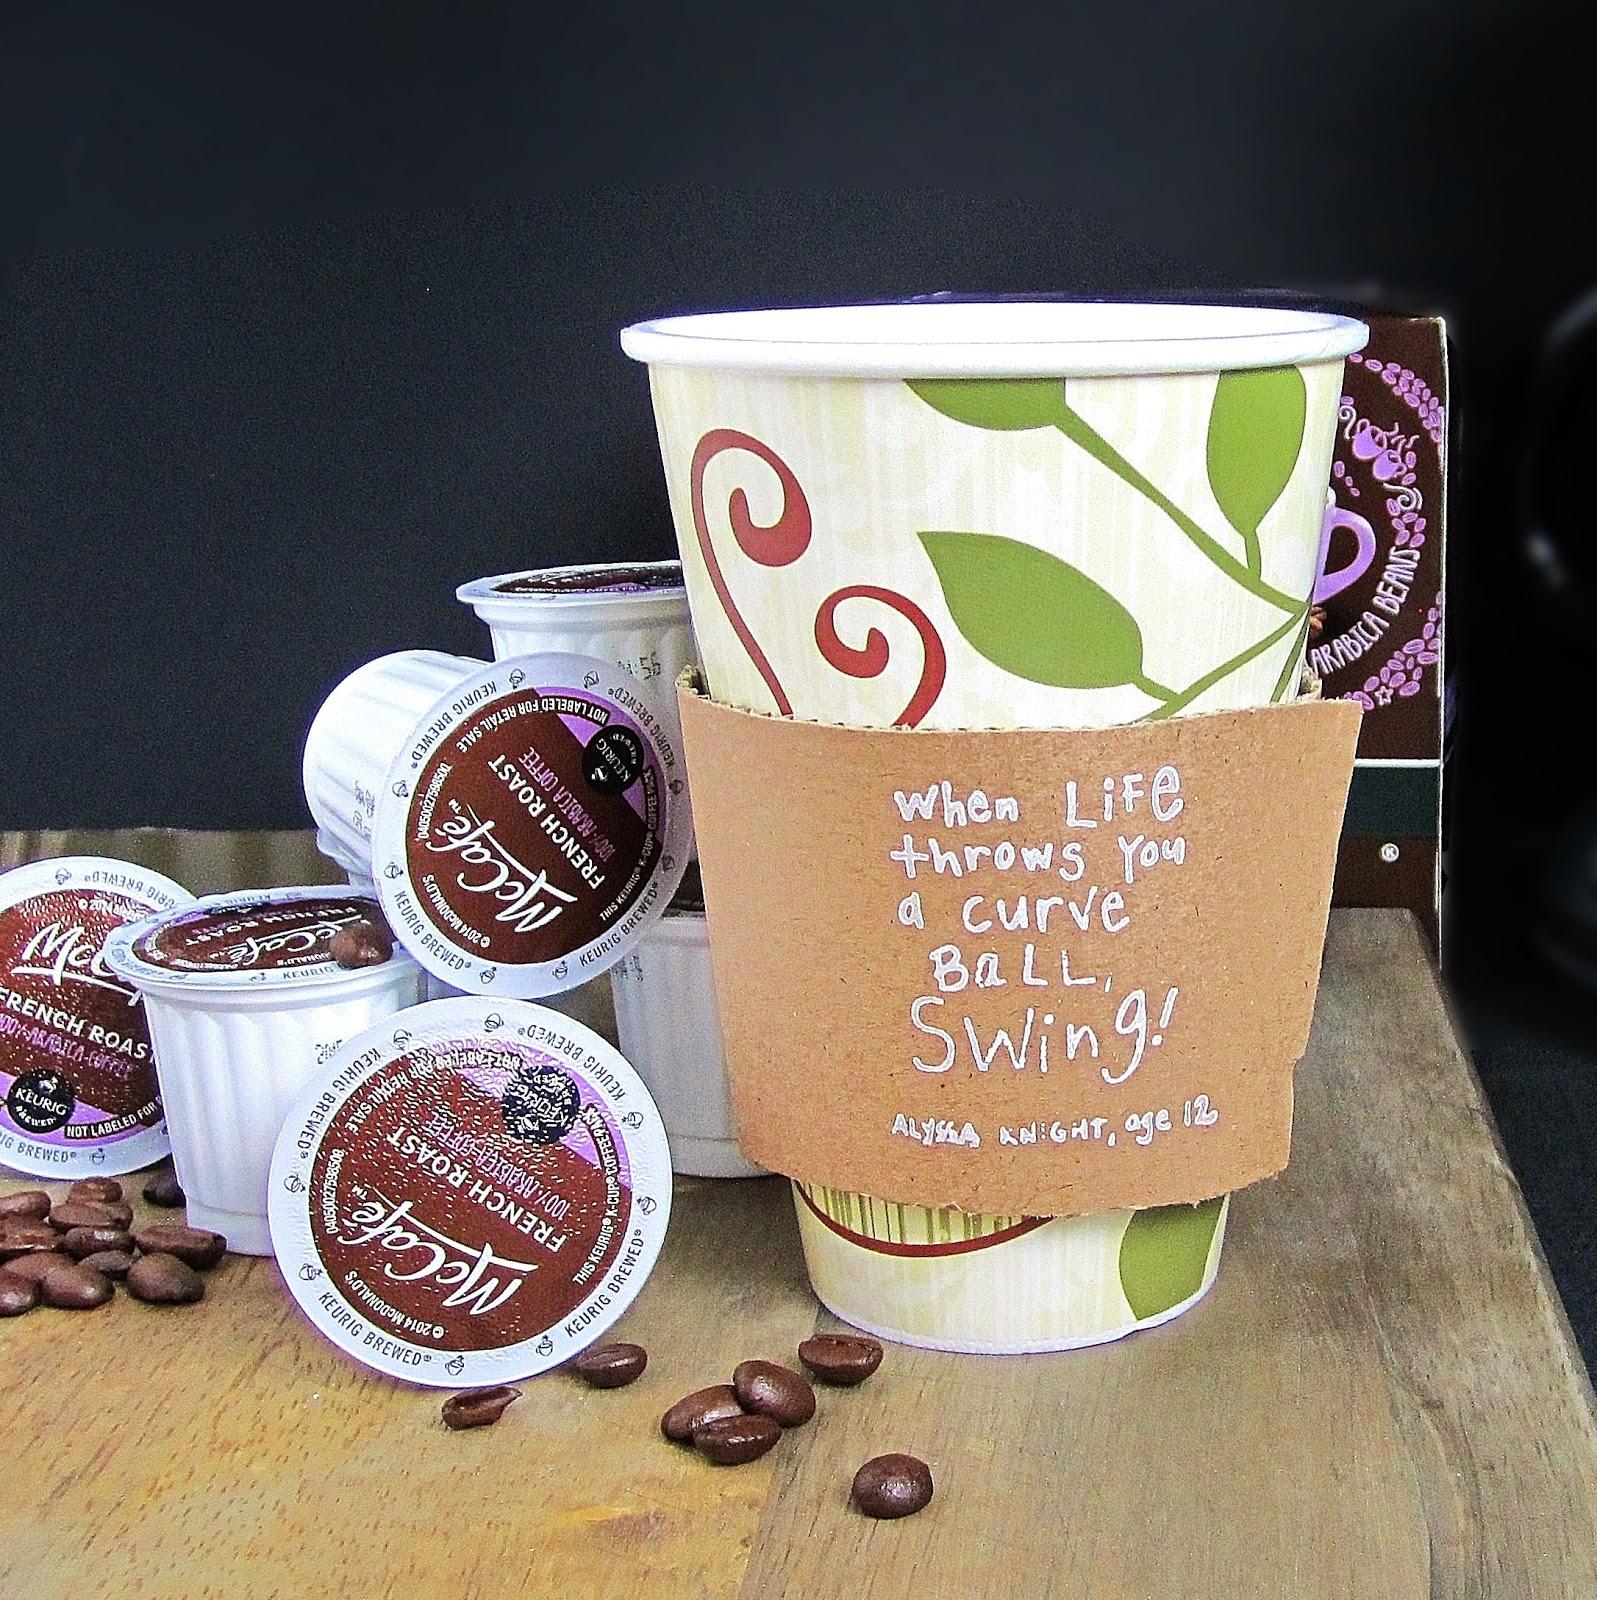 365 Designs new McCafé single brew coffee with printable cup sleeve